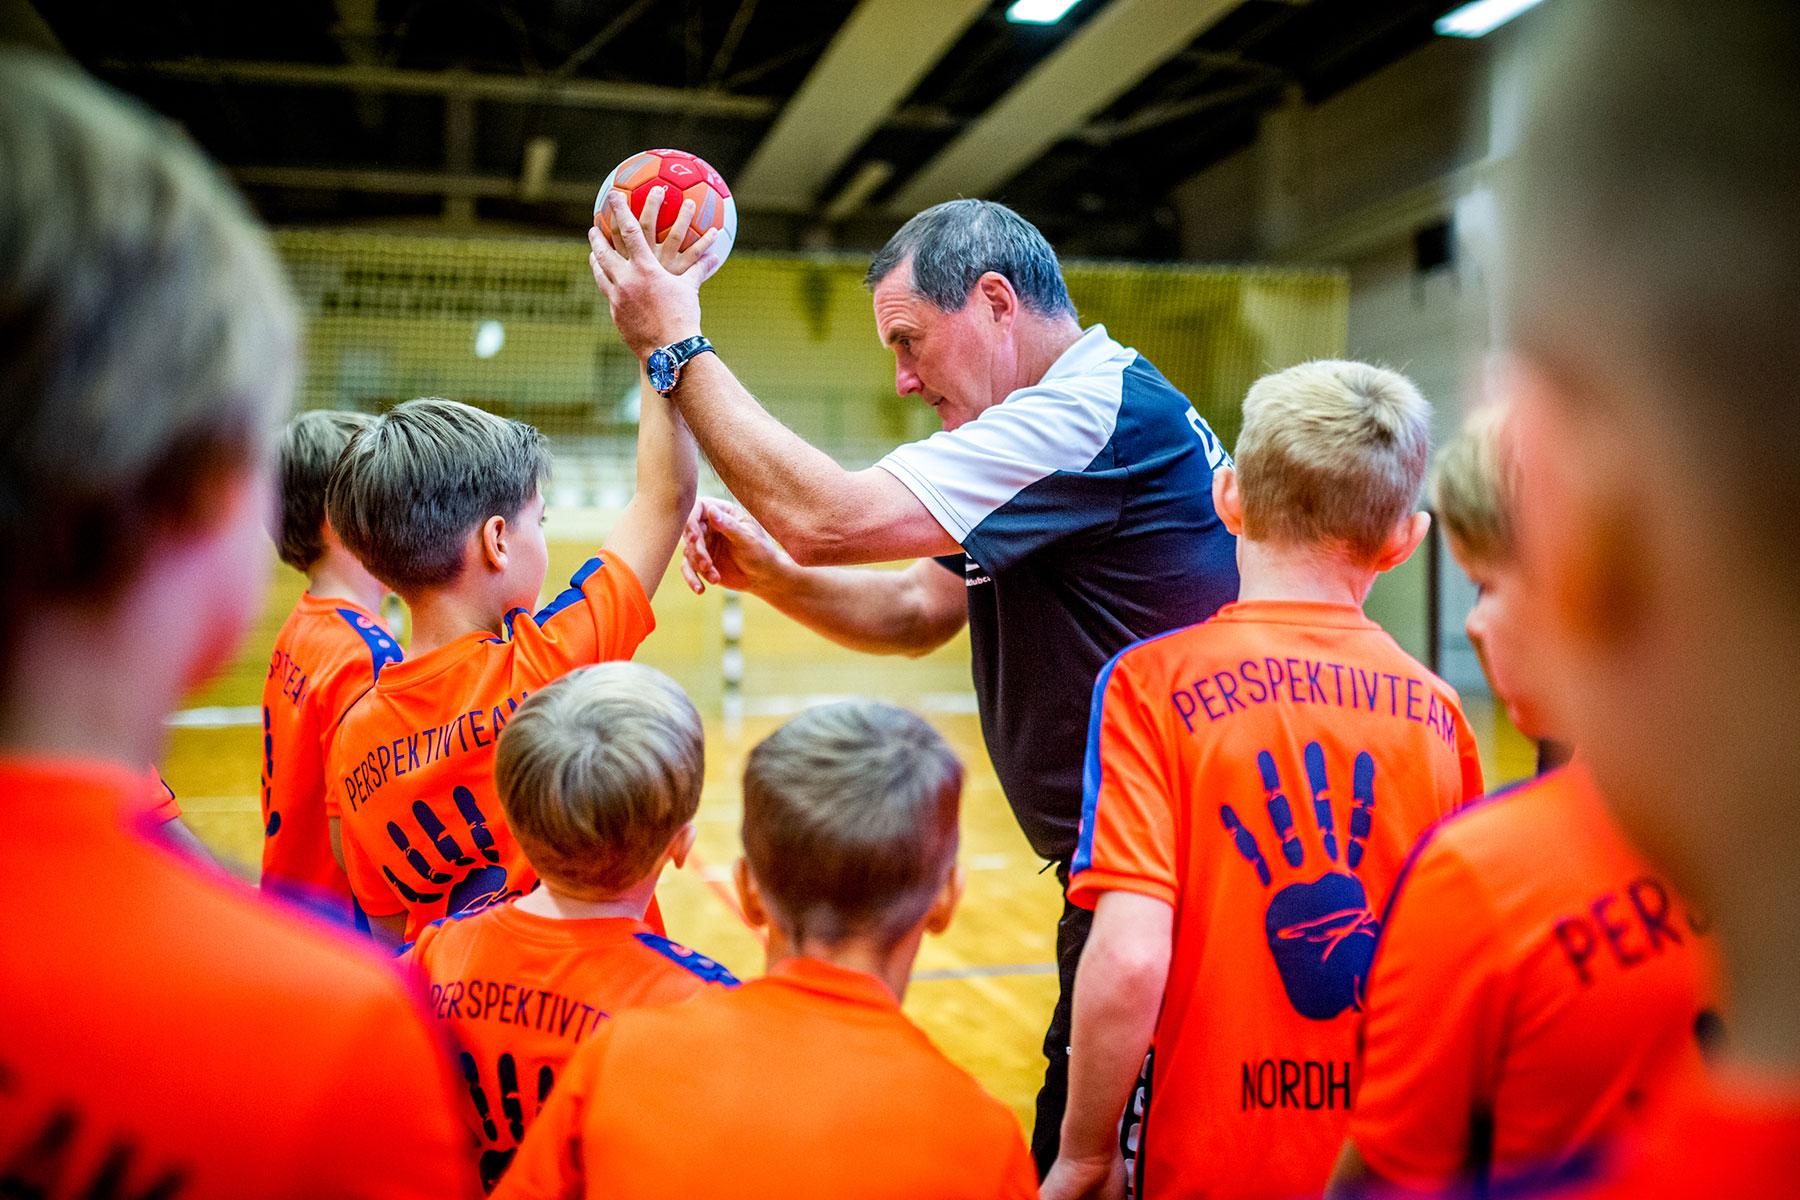 201809_Handballcamp_NDH (40)